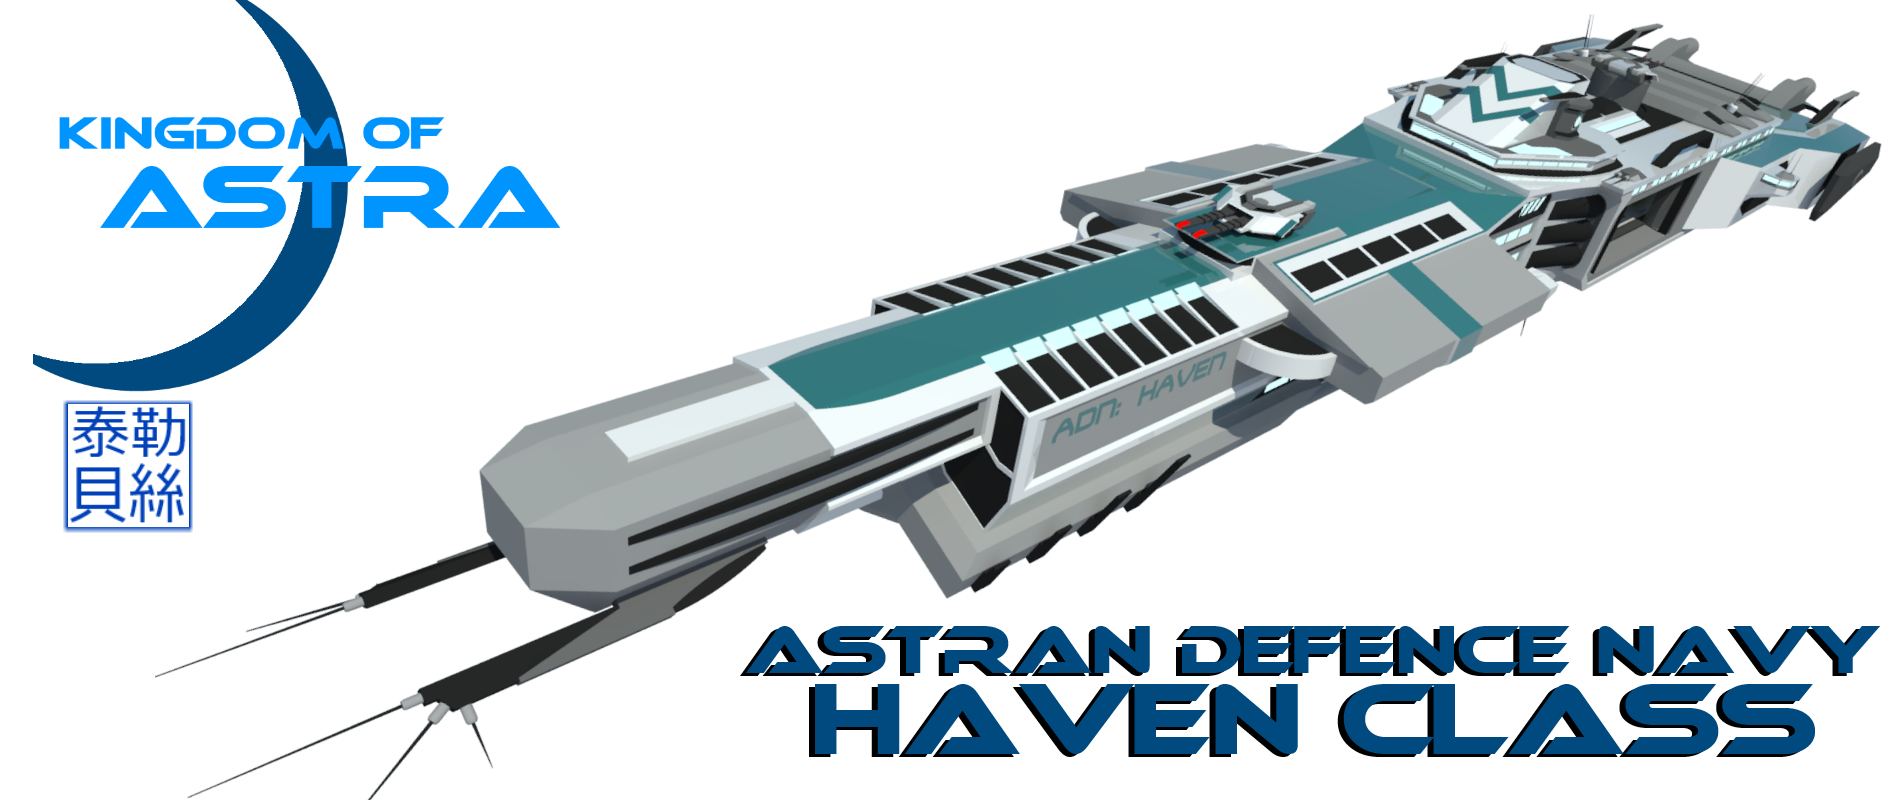 Haven Class Heavy Cruiser [ADN] by Gwentari